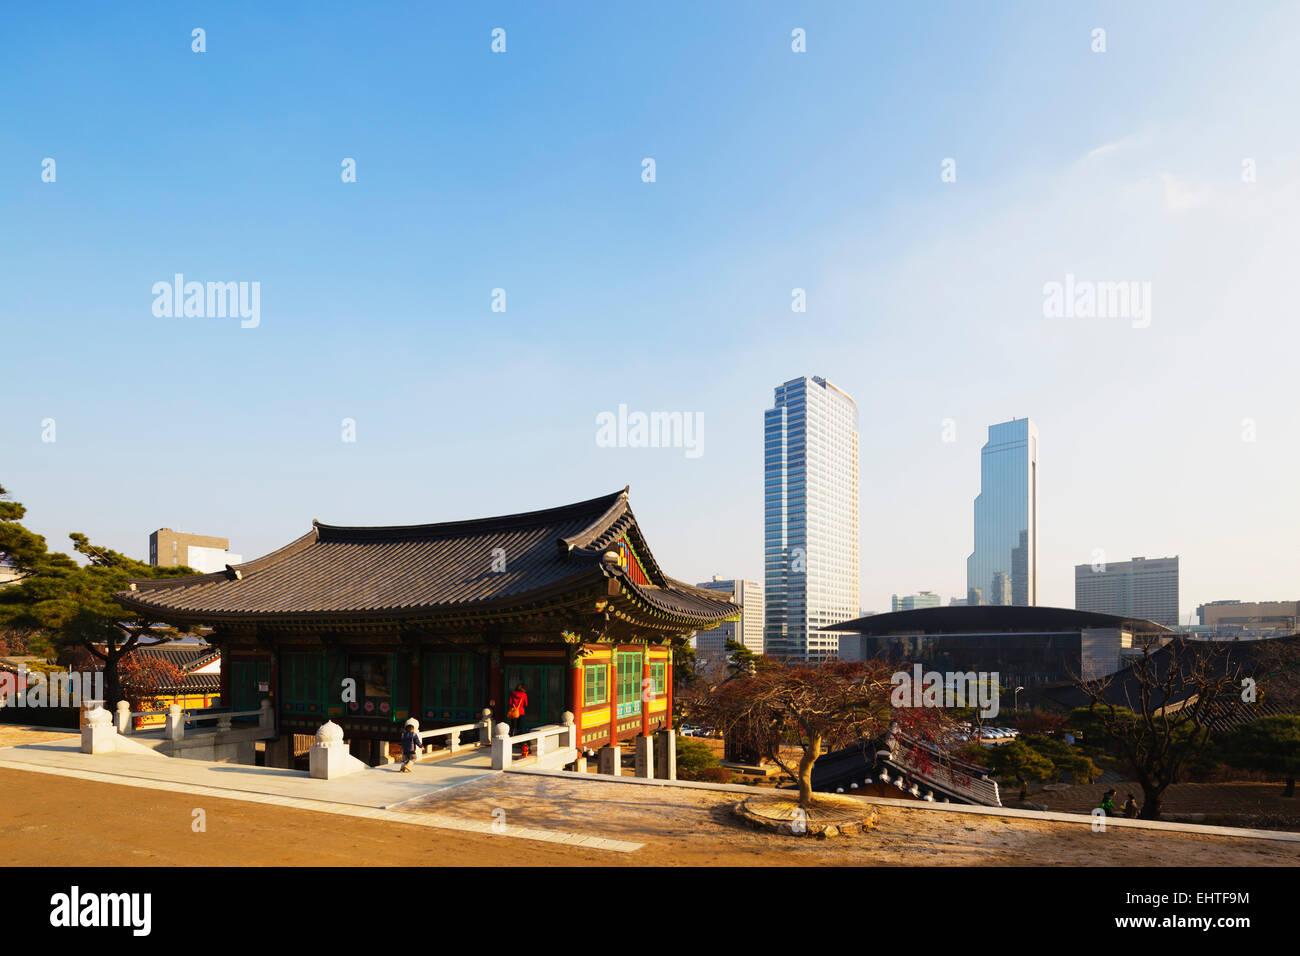 Asia, Republic of Korea, South Korea, Seoul, Bongeun-sa temple - Stock Image